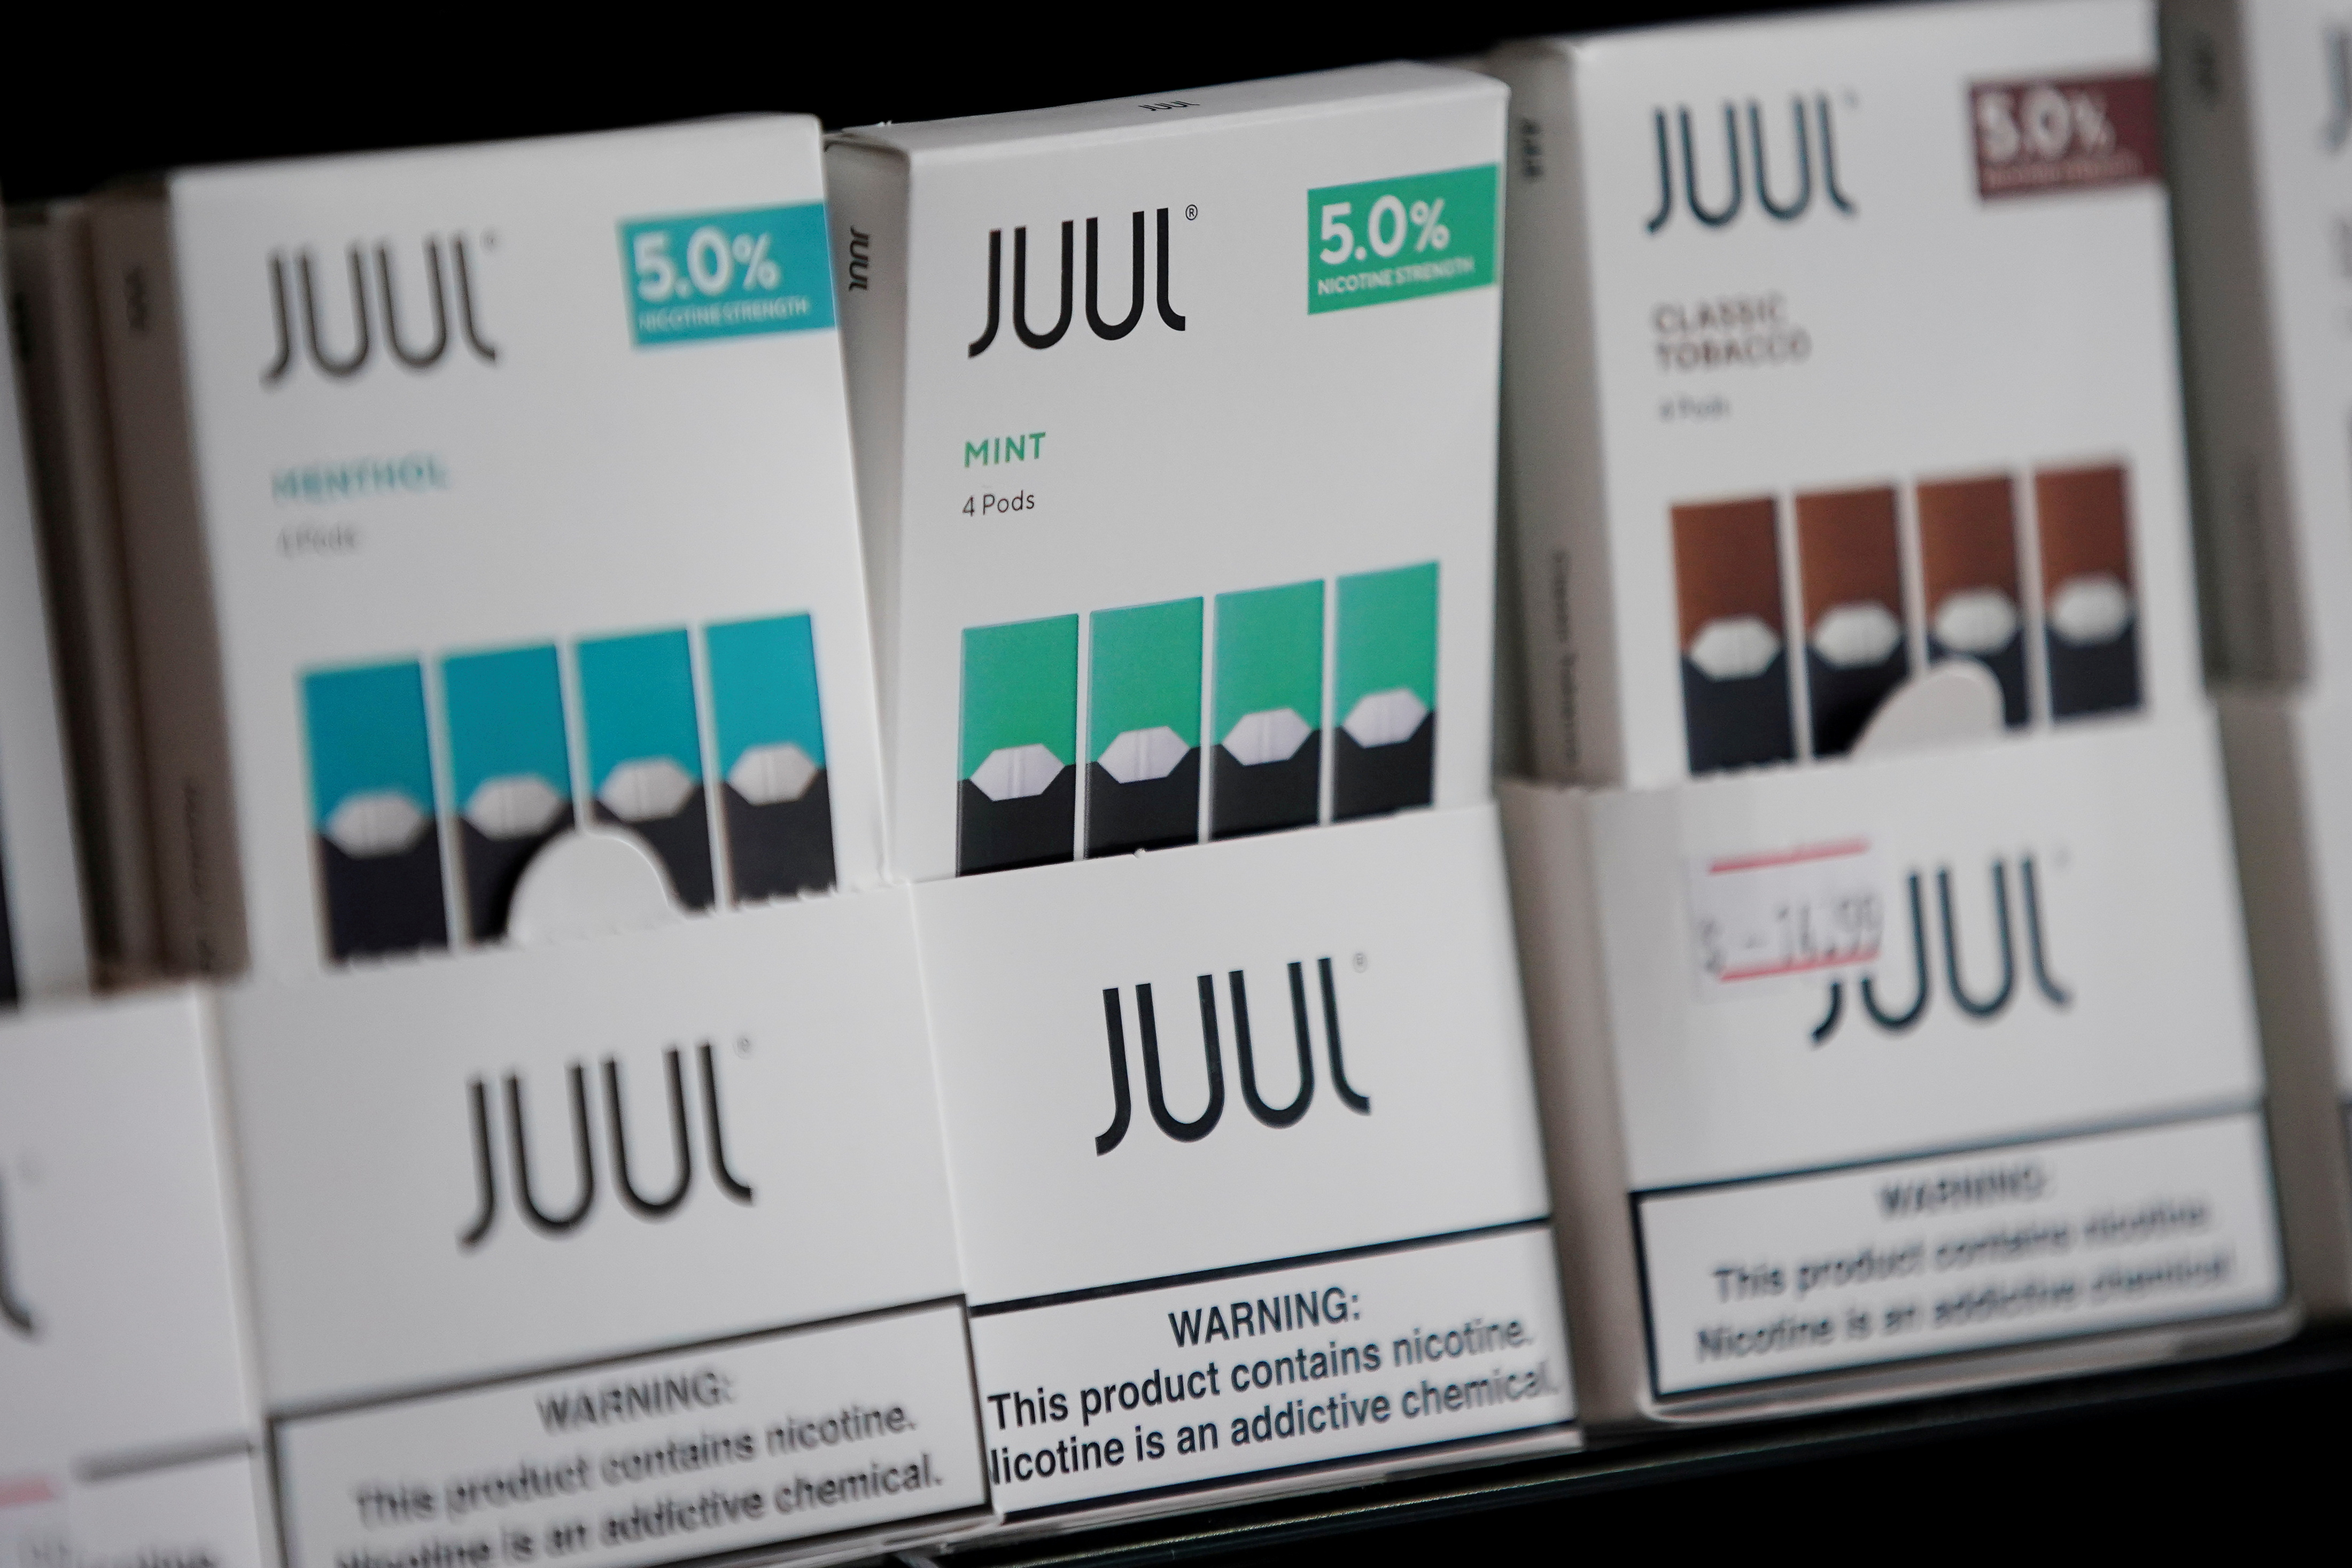 Juul brand vape cartridges are pictured for sale at a shop in Atlanta, Georgia, U.S., September 26, 2019. REUTERS/Elijah Nouvelage